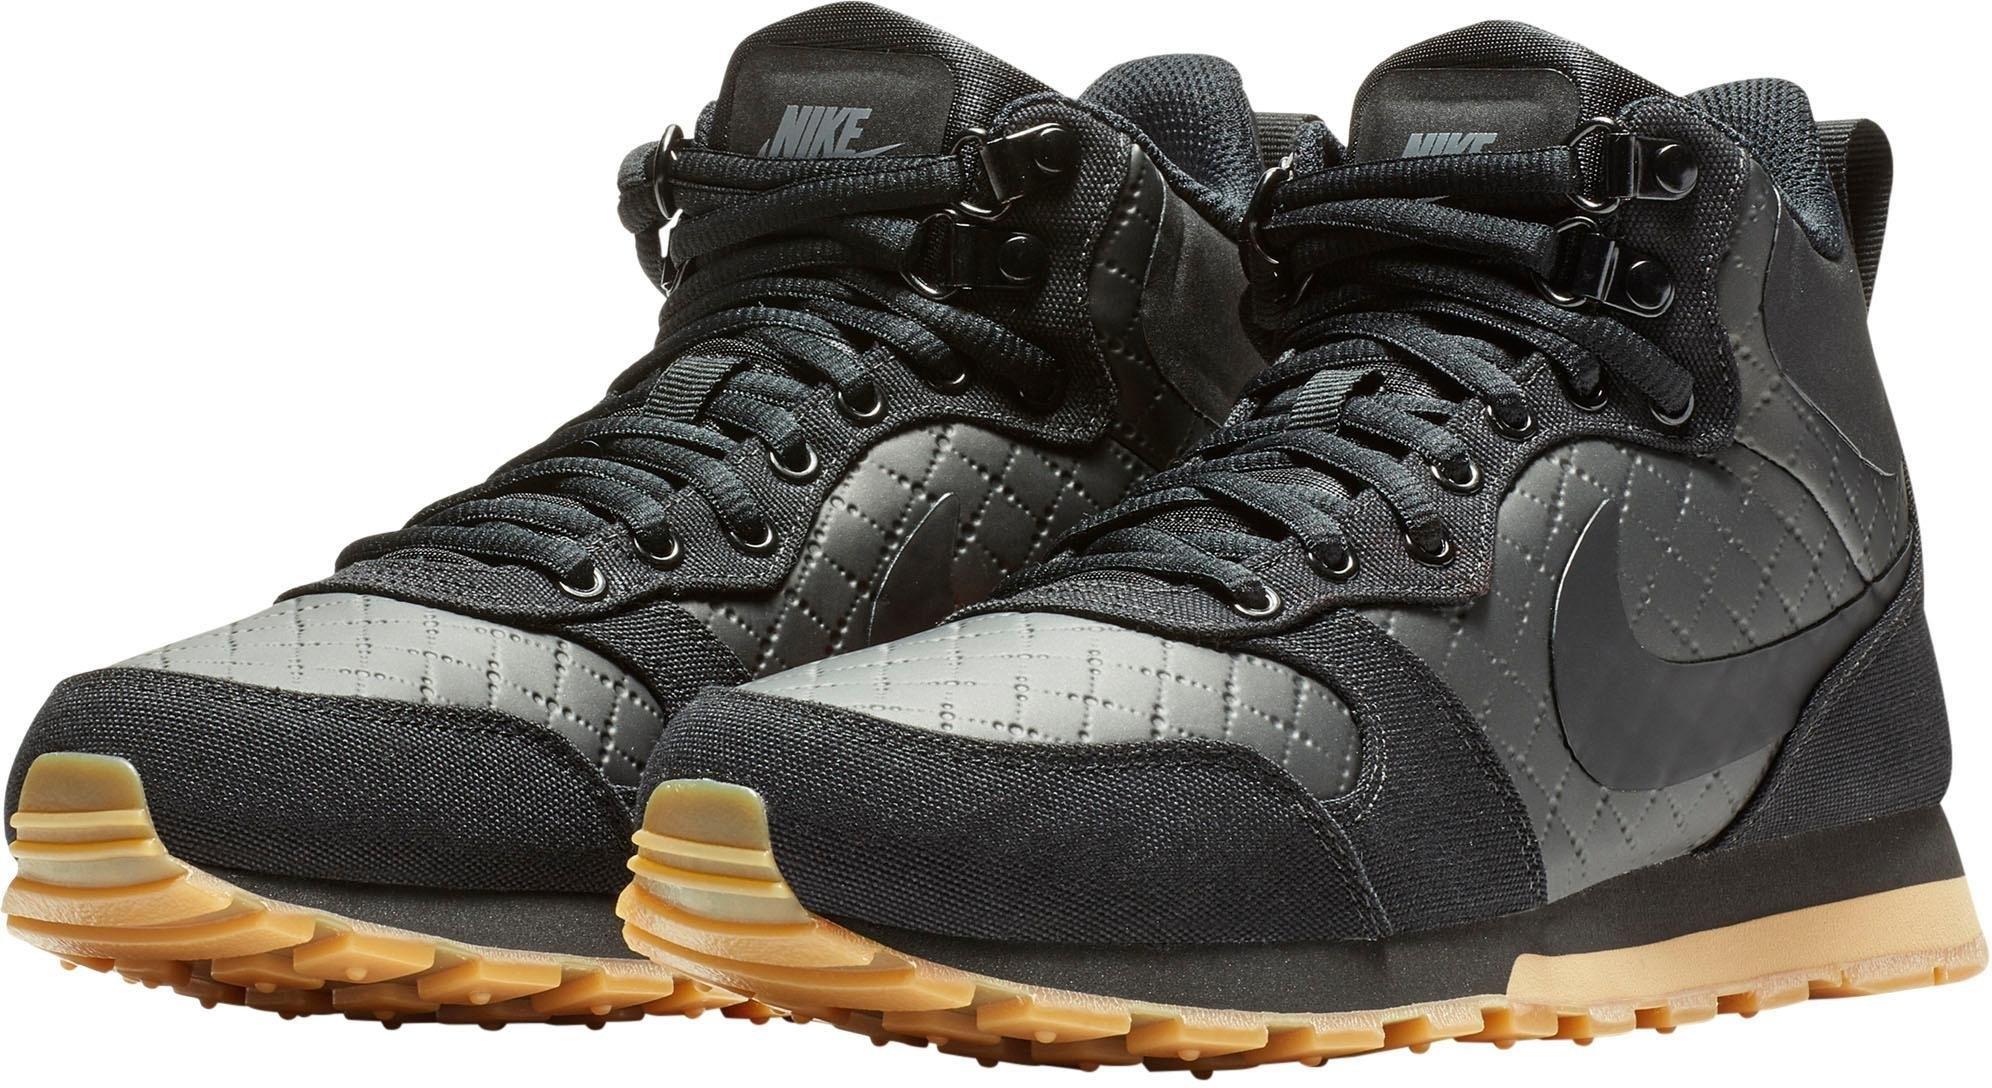 f519794d654 Afbeeldingsbron: Nike Sportswear sneakers »Wmns MD Runner 2 Mid Premium«